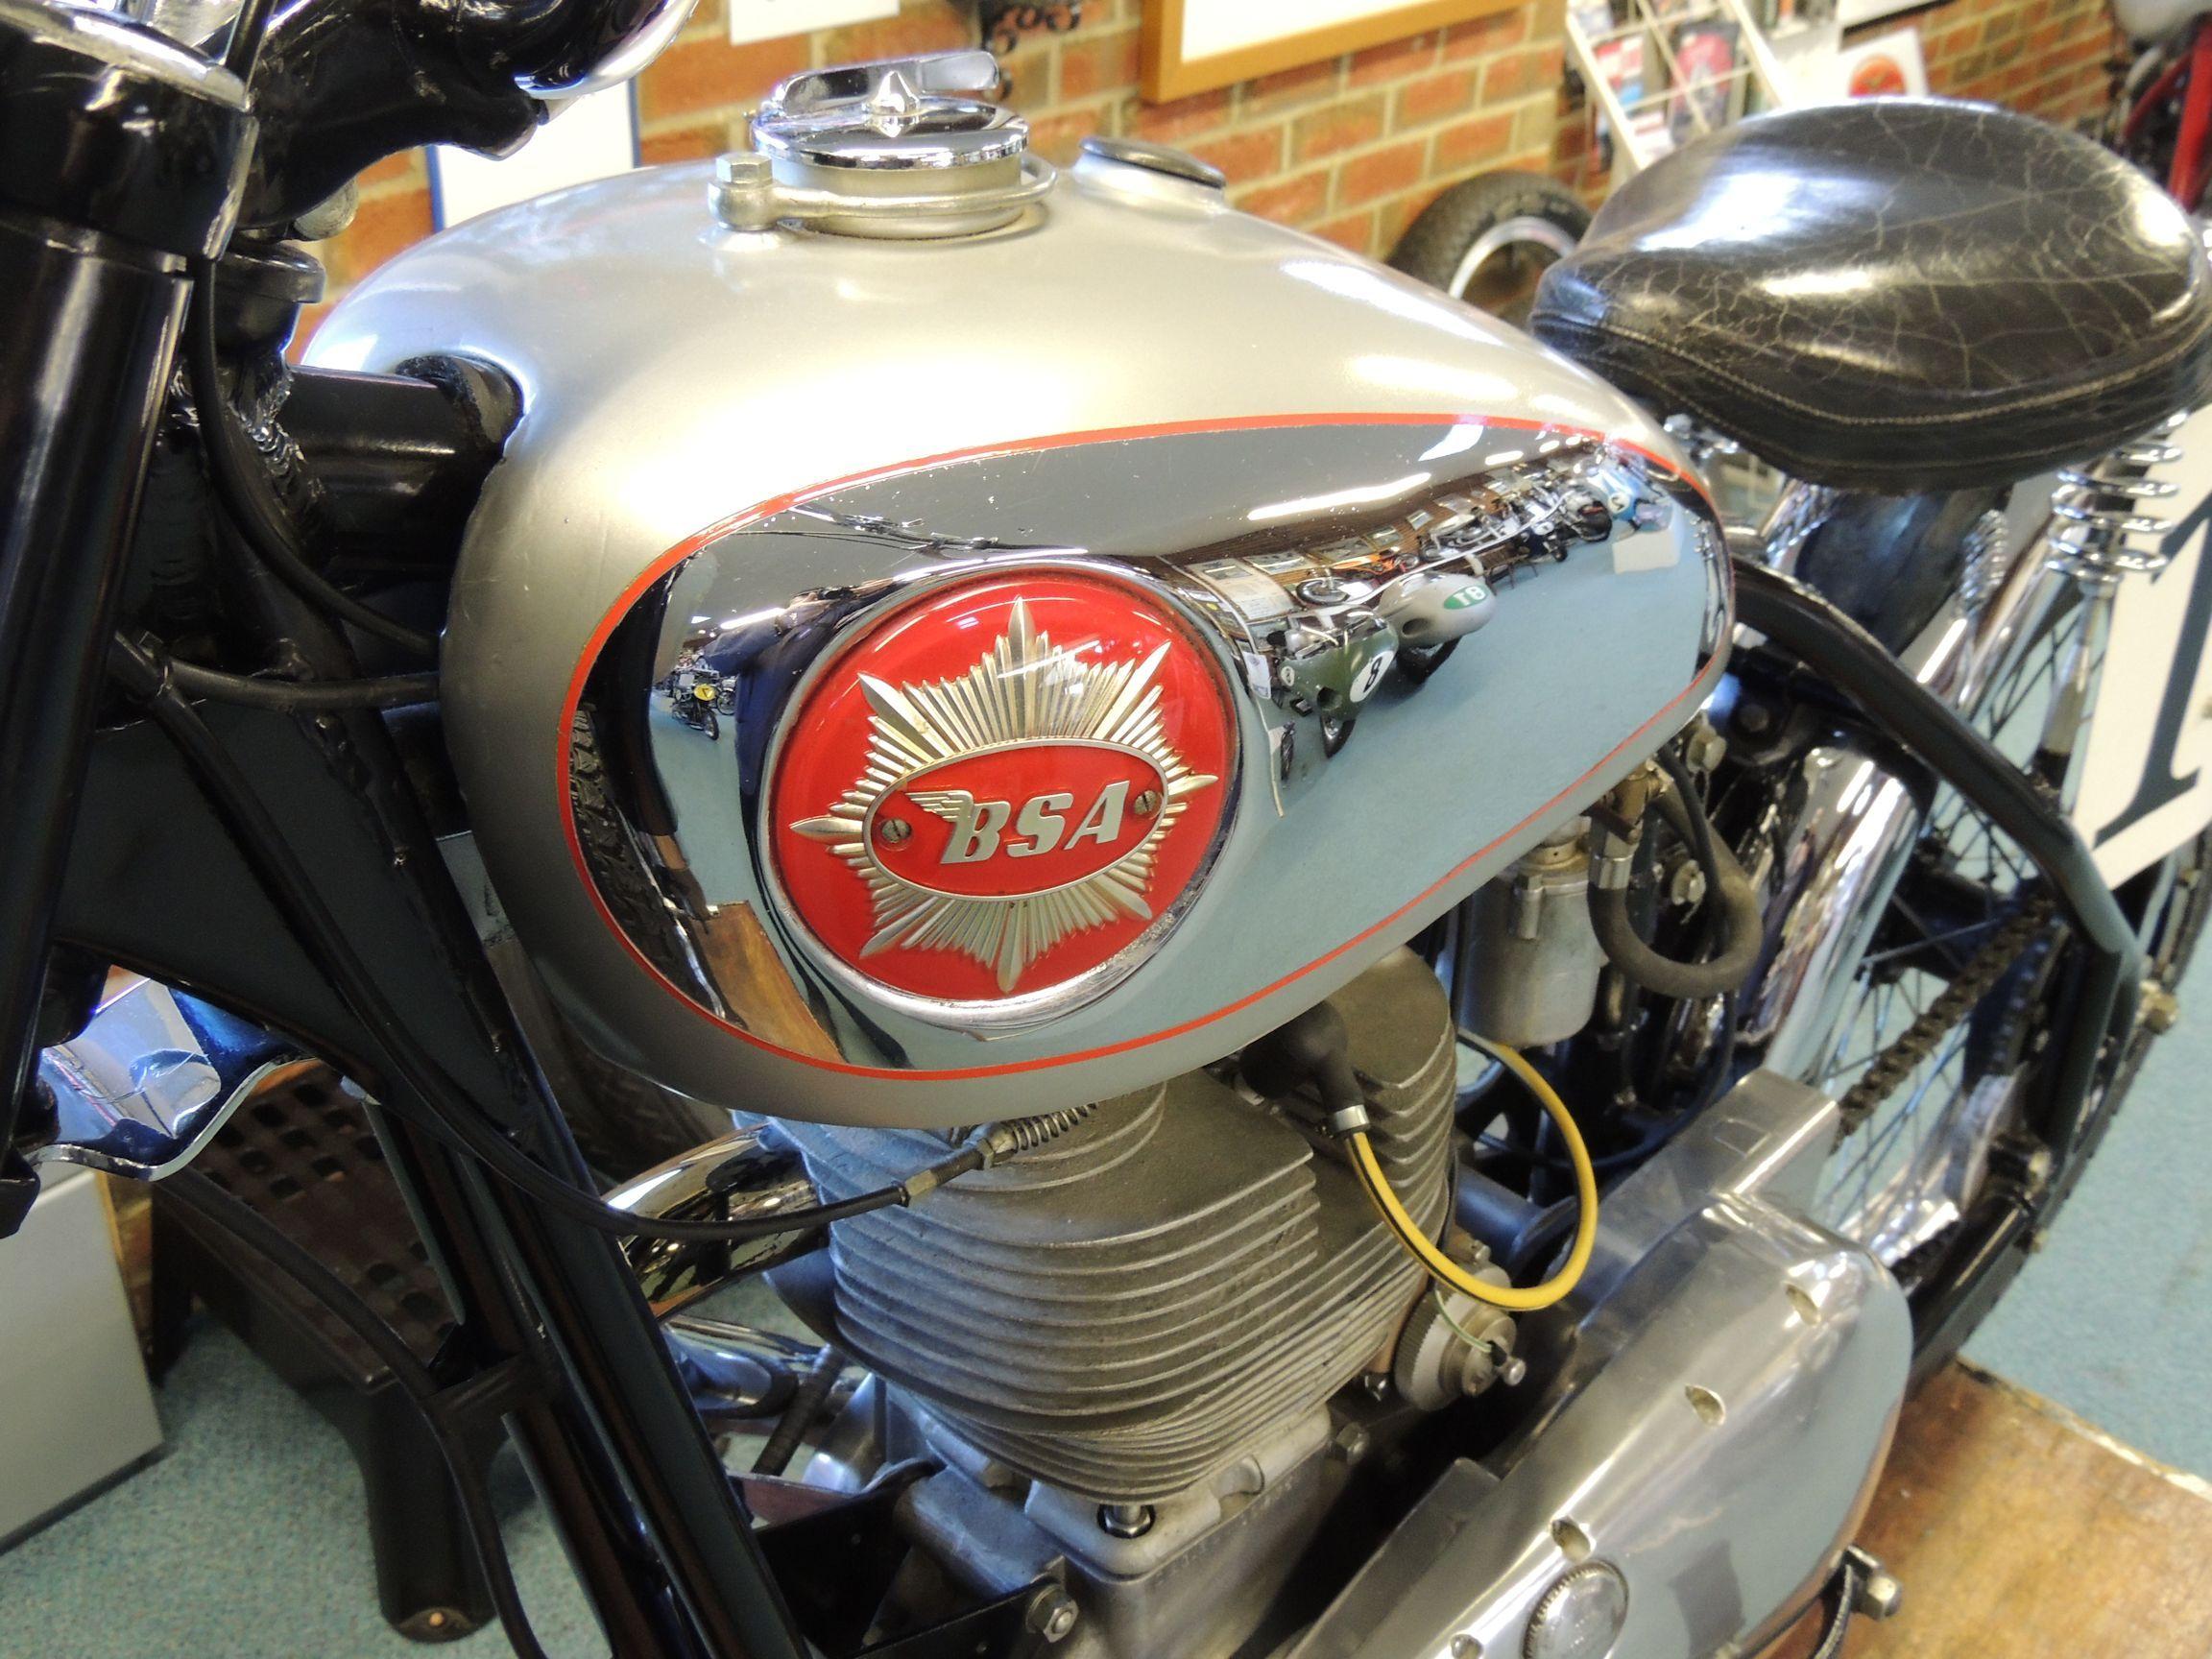 Pin By Larry Tipton On Motorcycles Bike Hard Hat Motorcycle